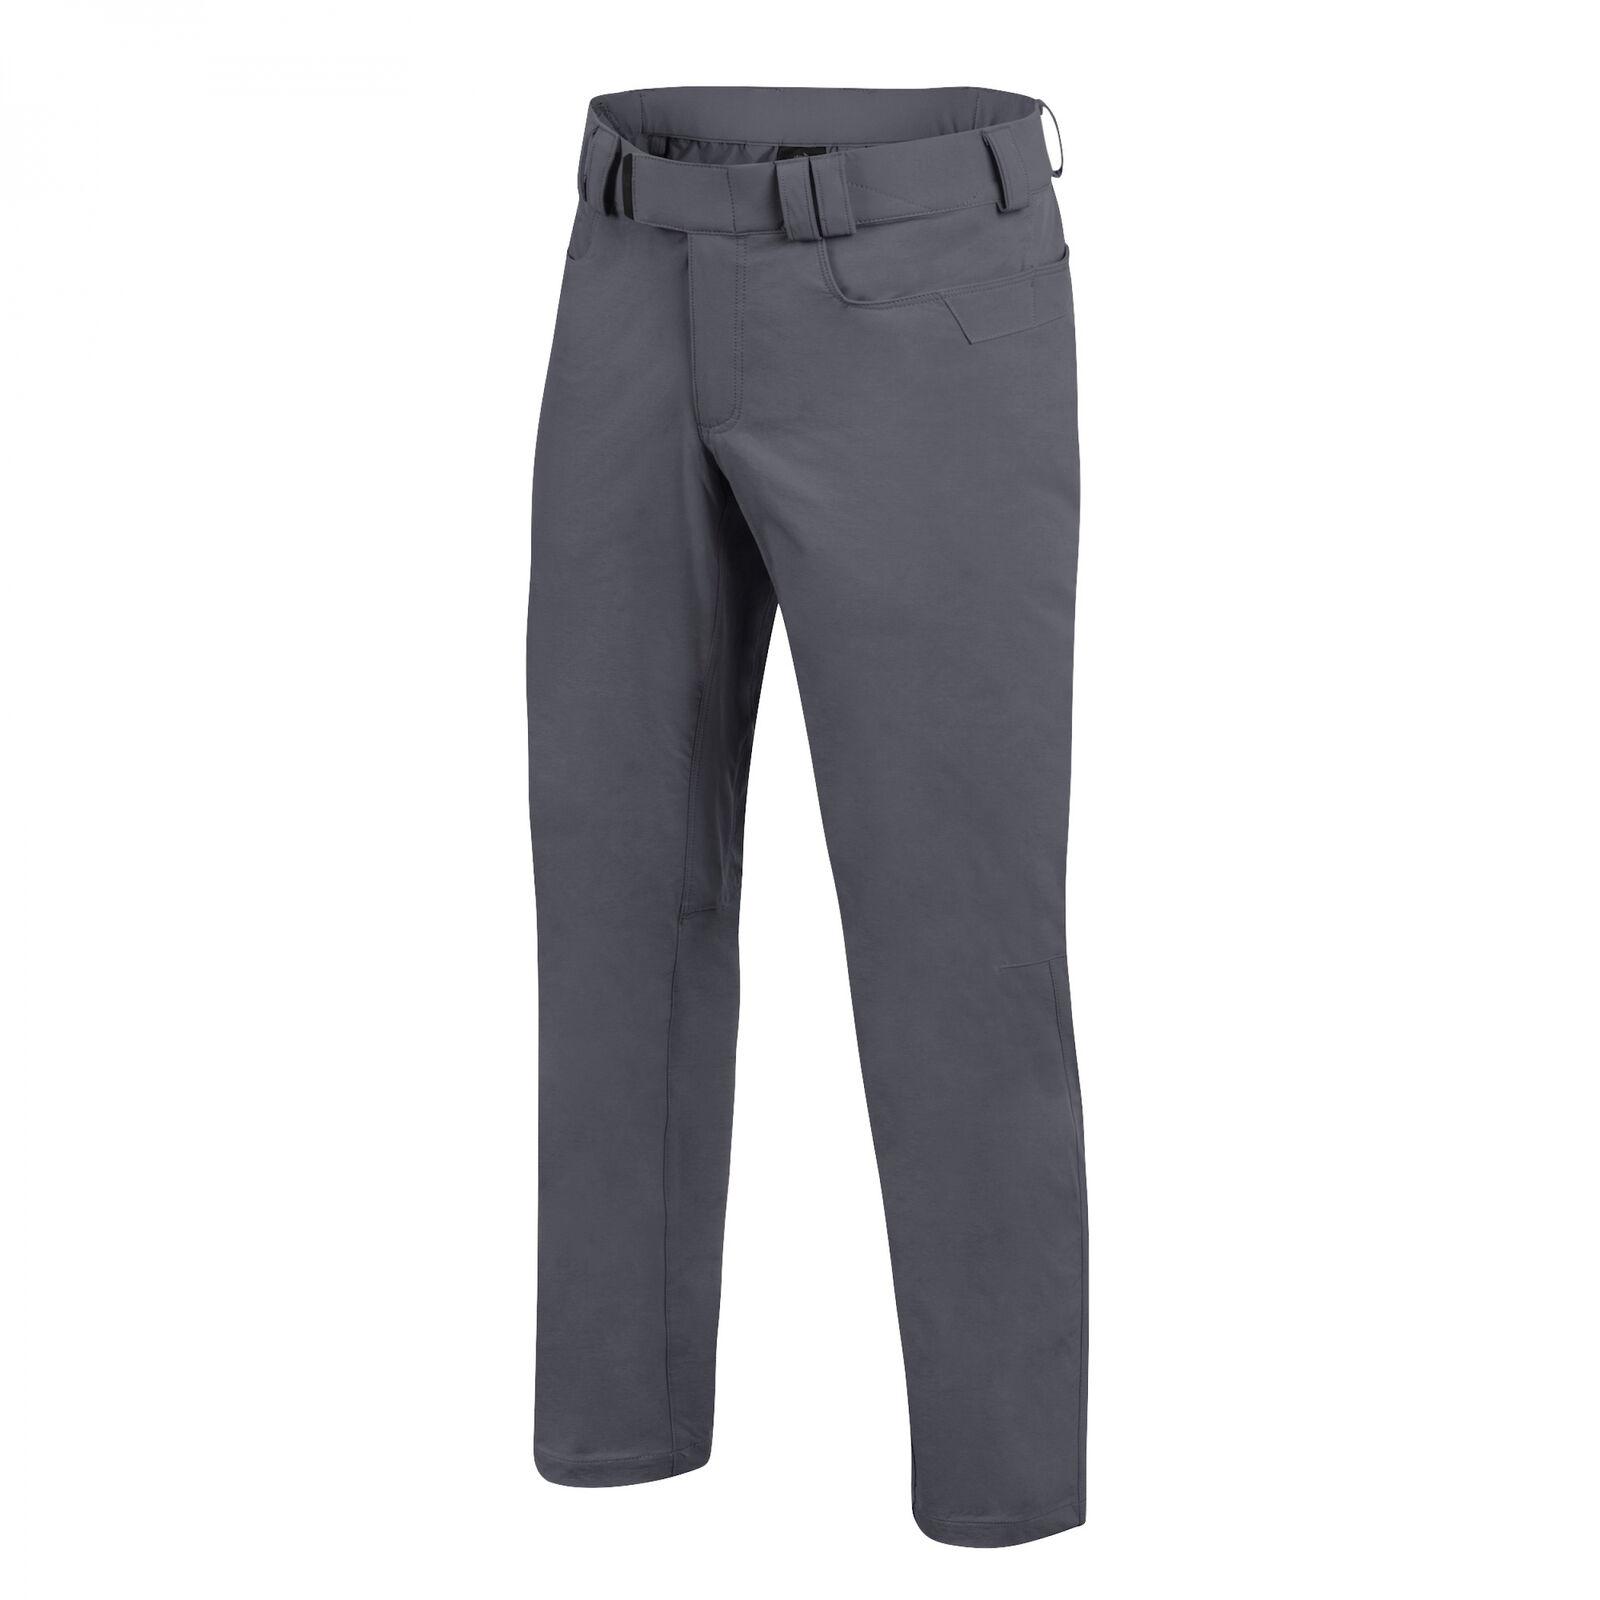 Helikon-Tex Cogreen Tactical Pants  -VersaStretch- Shadow Grey  save up to 70%